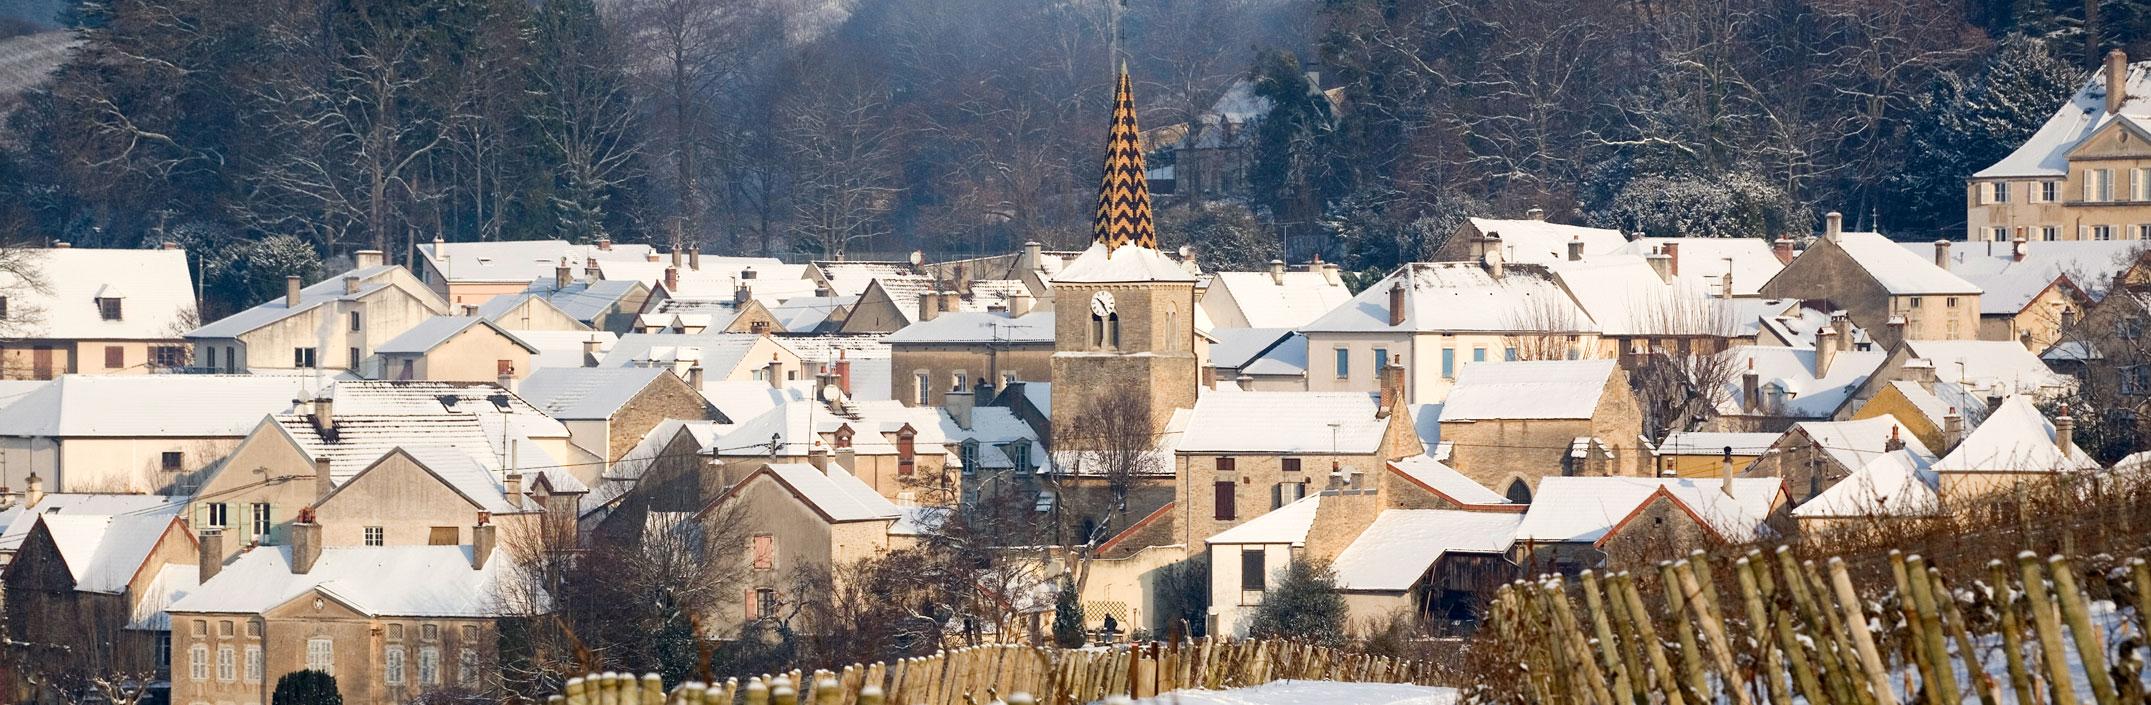 Domaine Dubreuil-Fontaine, Pernand Vergelesses, Bourgogne, Armelle photographe